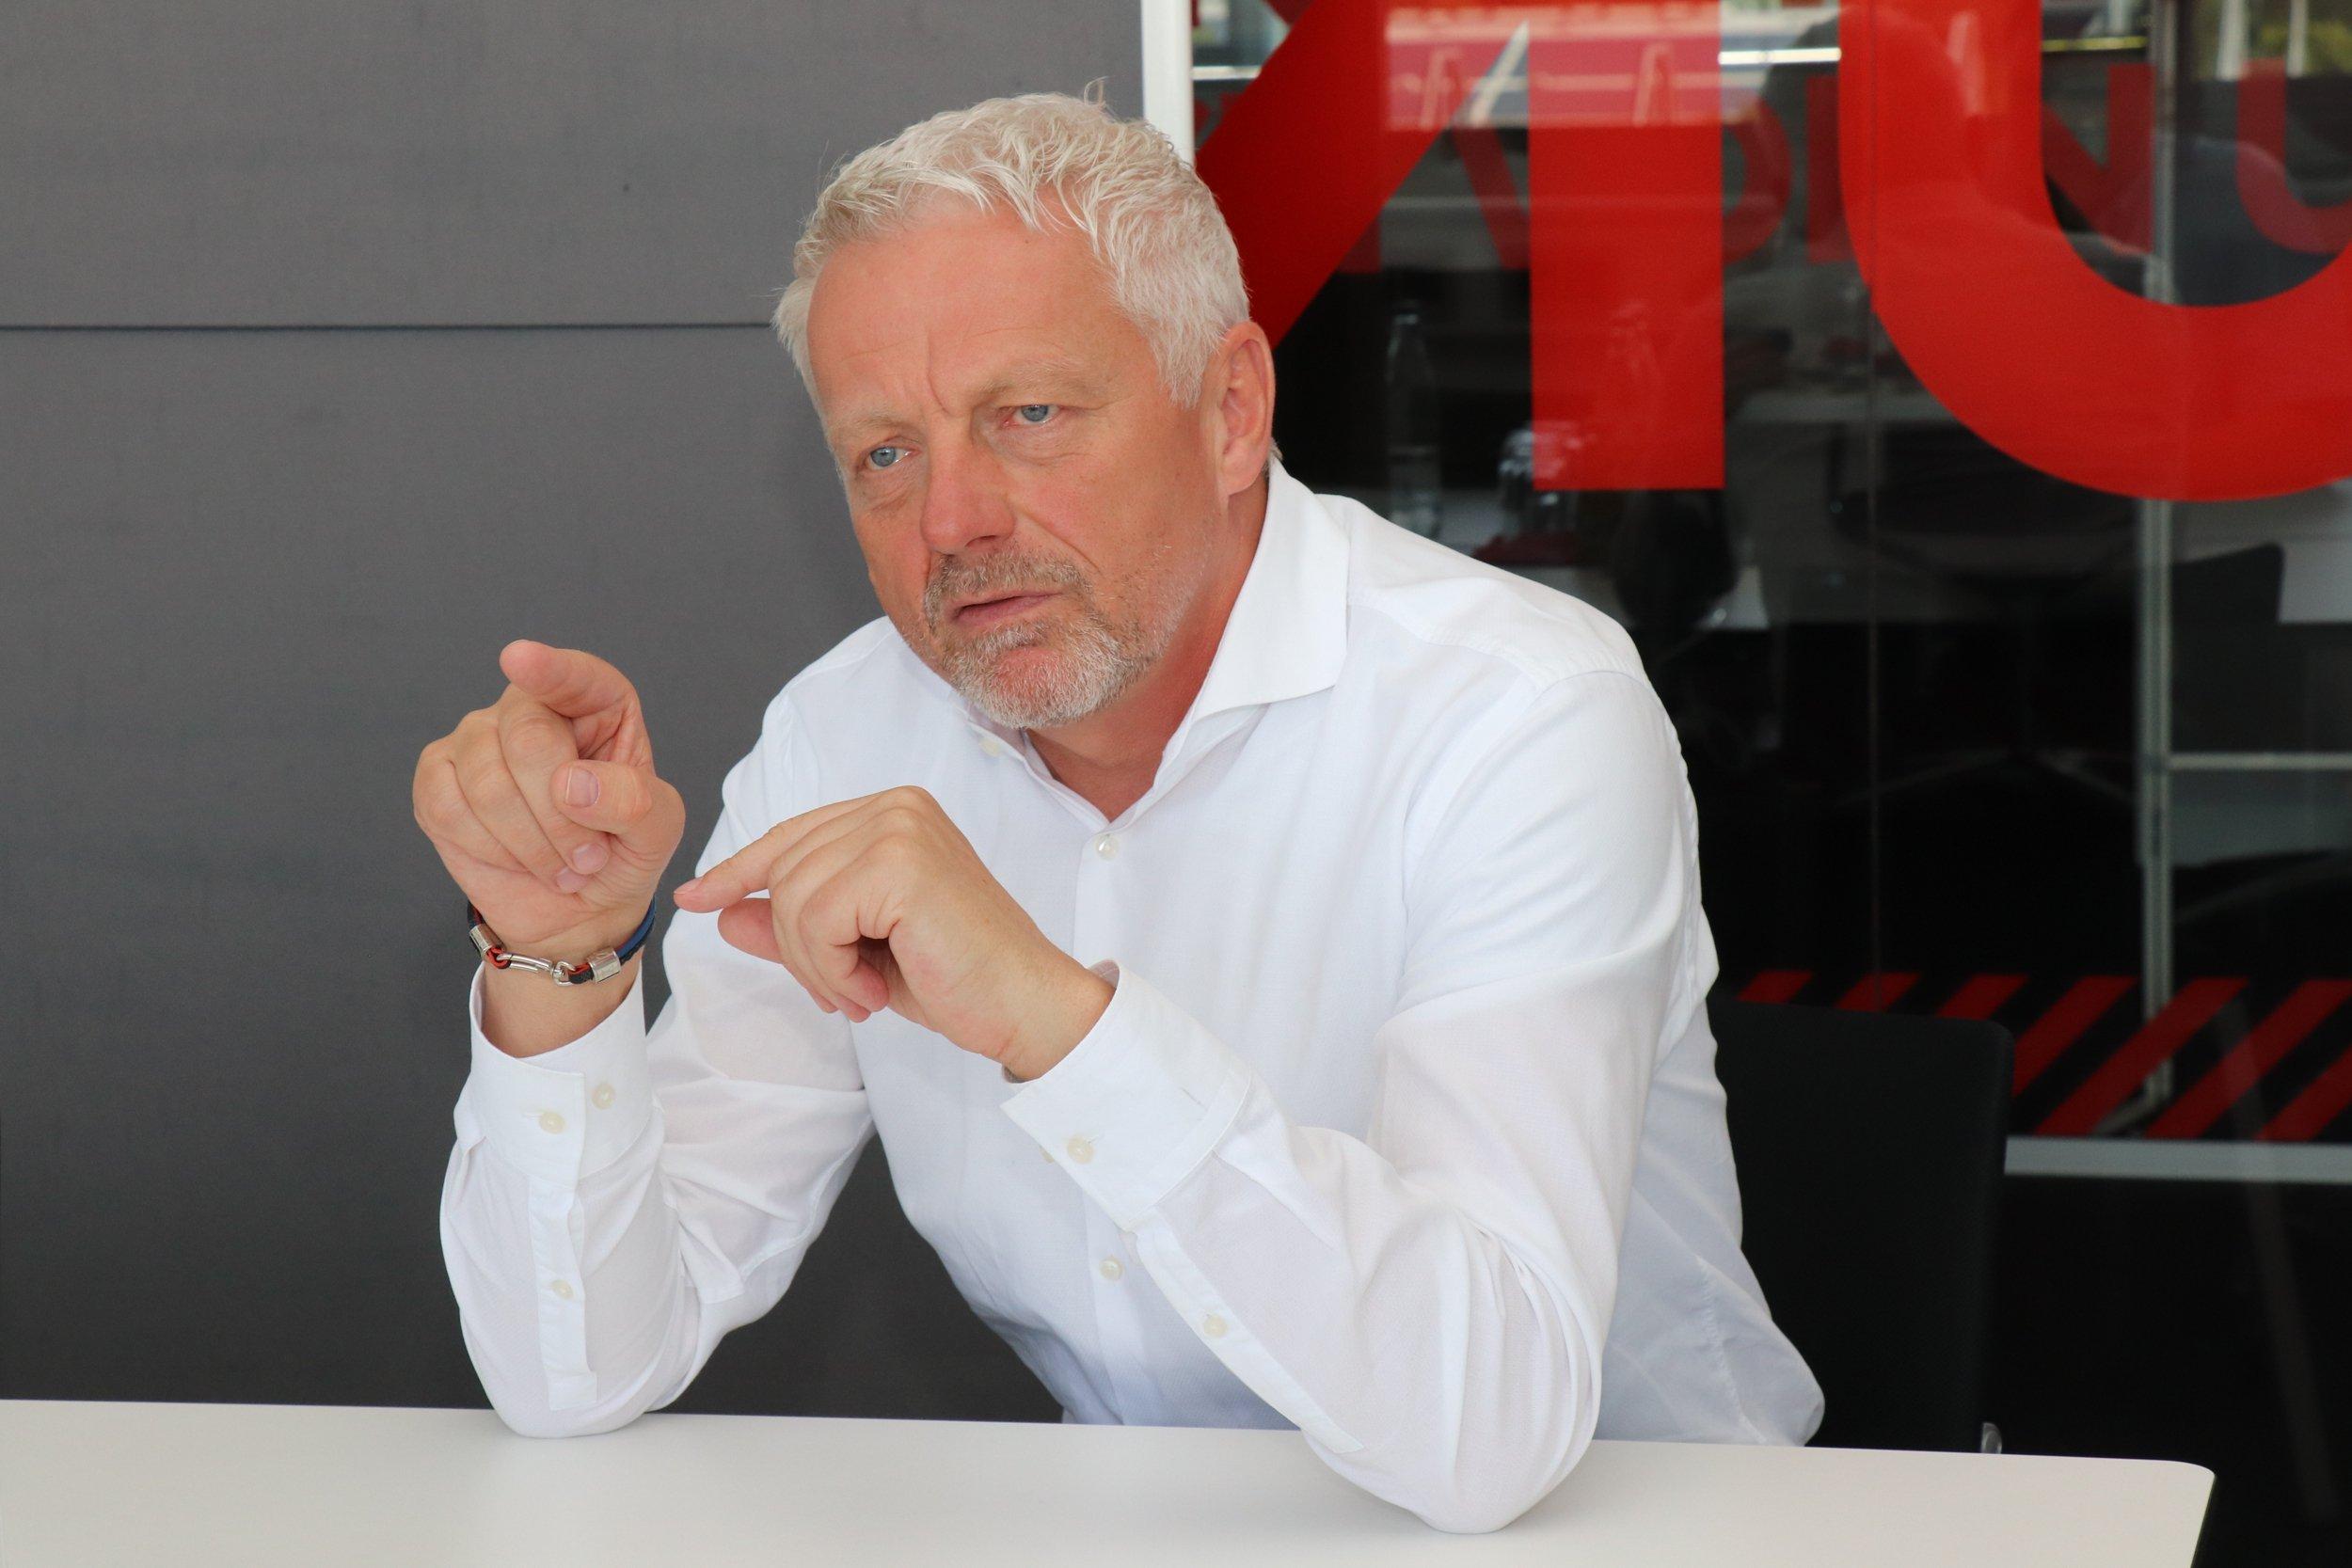 Klemens Isenmann, Geschäftsführer der Alexander Bürkle GmbH & Co. KG.